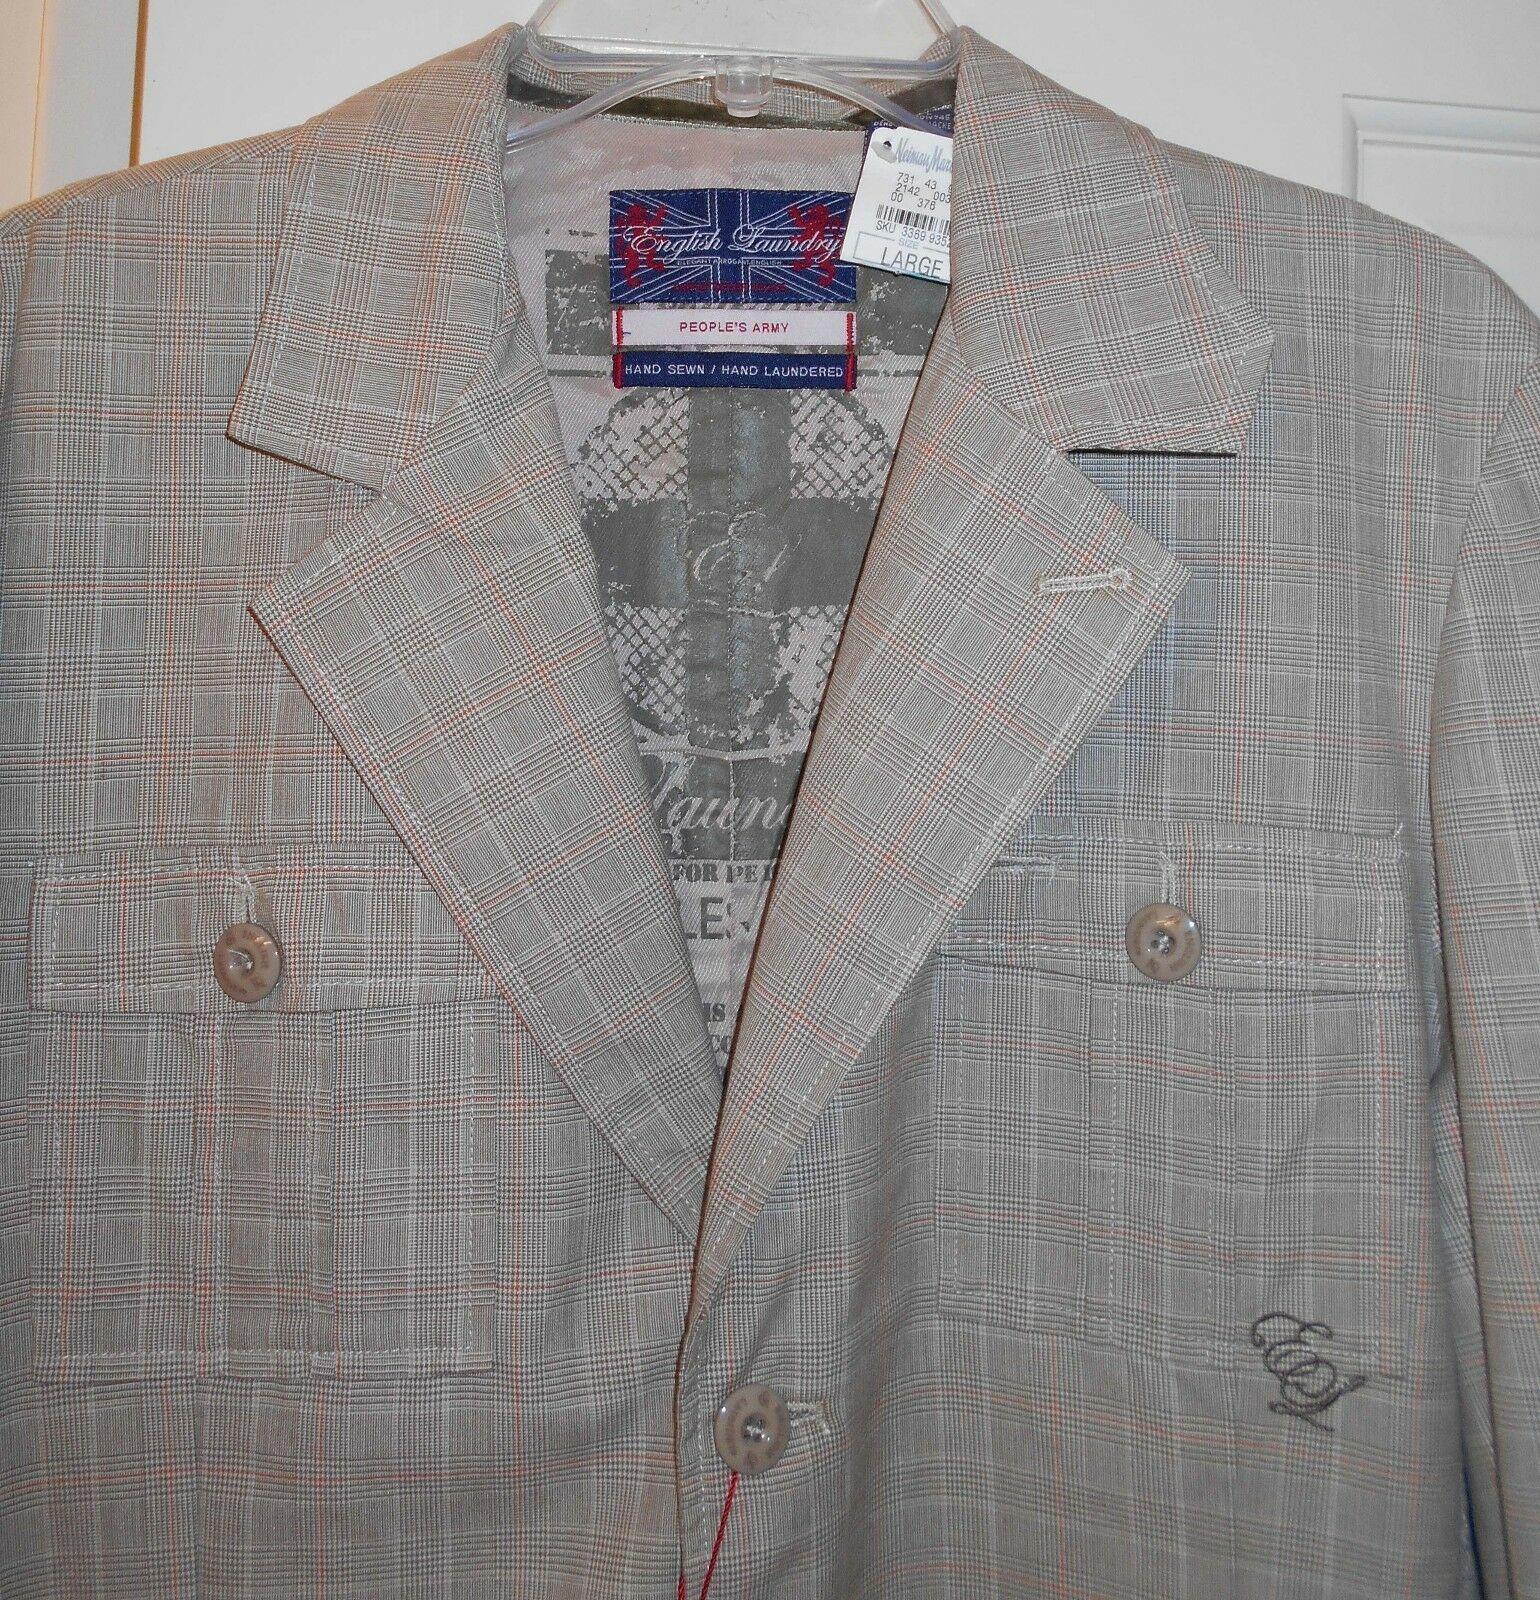 New 195 English Laundry Denby Dale Olive Brown Plaid Elbow Pads Coat Jacket L Ebay Padded Coat Blazer Coat Coats Jackets [ 1600 x 1540 Pixel ]